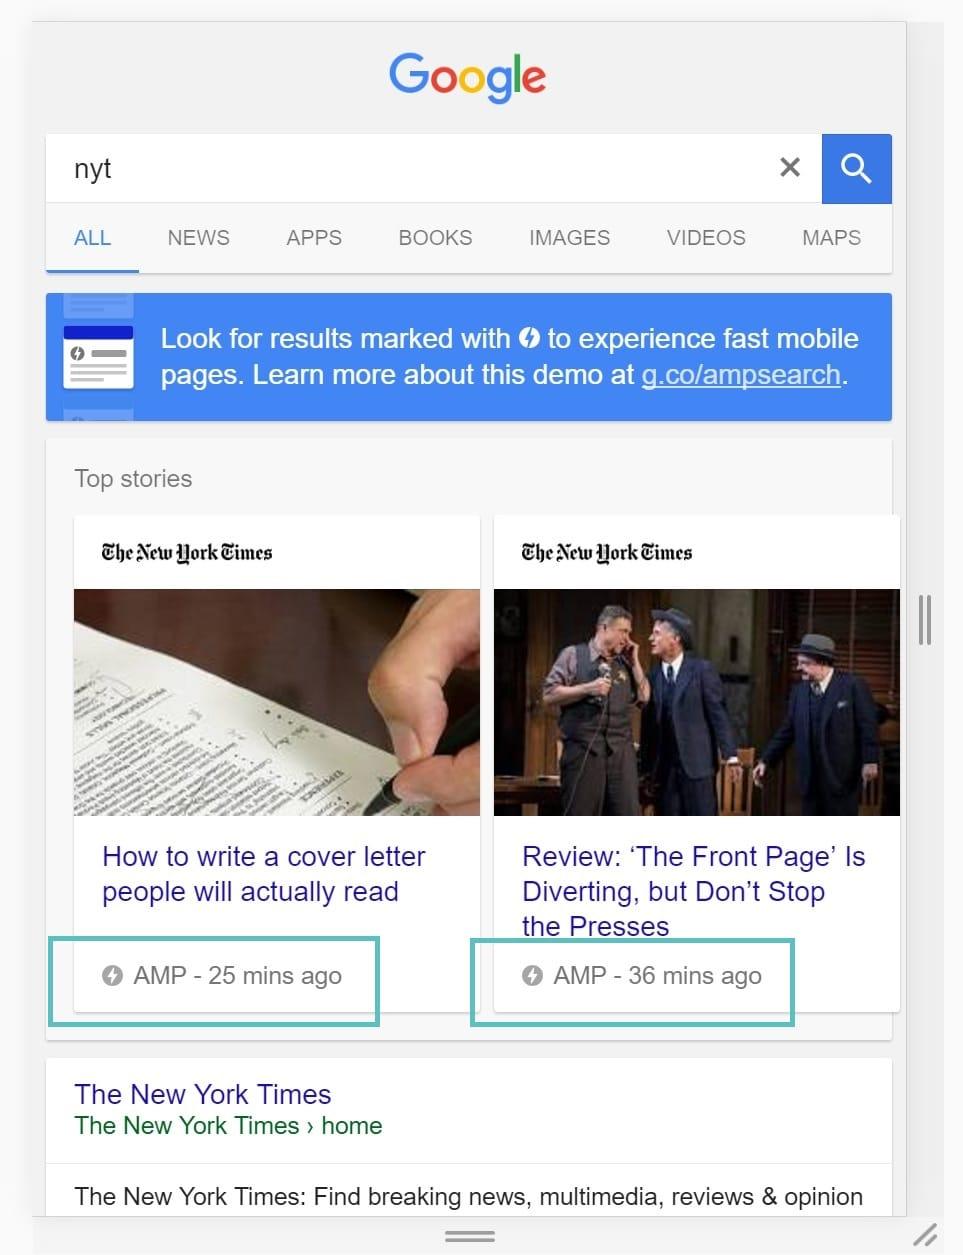 Carrousel Google AMP